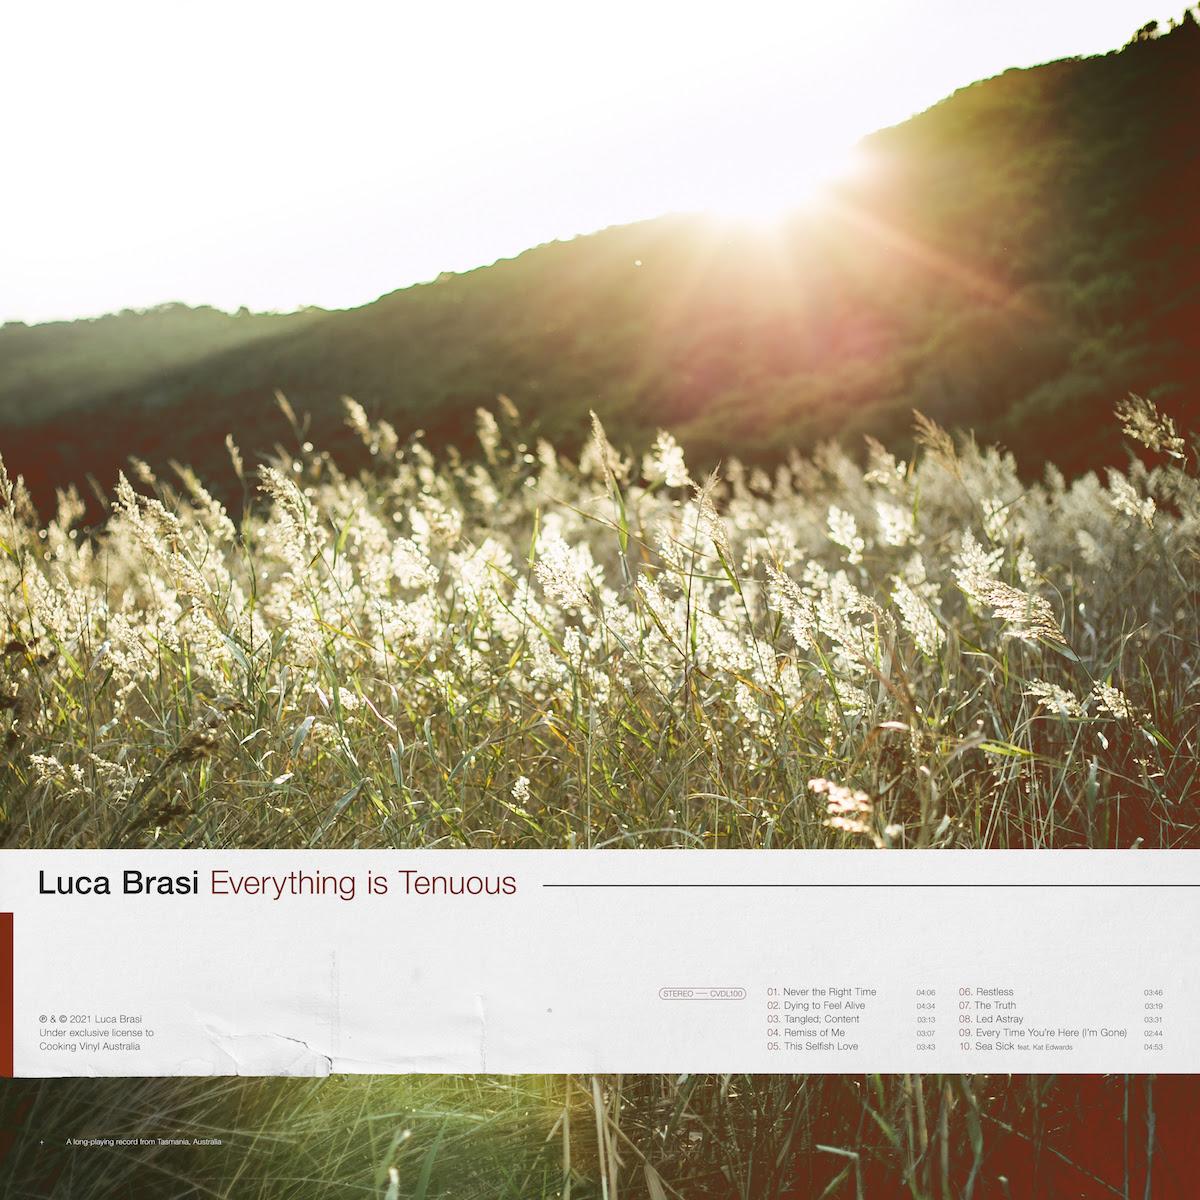 Luca Brasi 2021 album Everything Is Tenuous